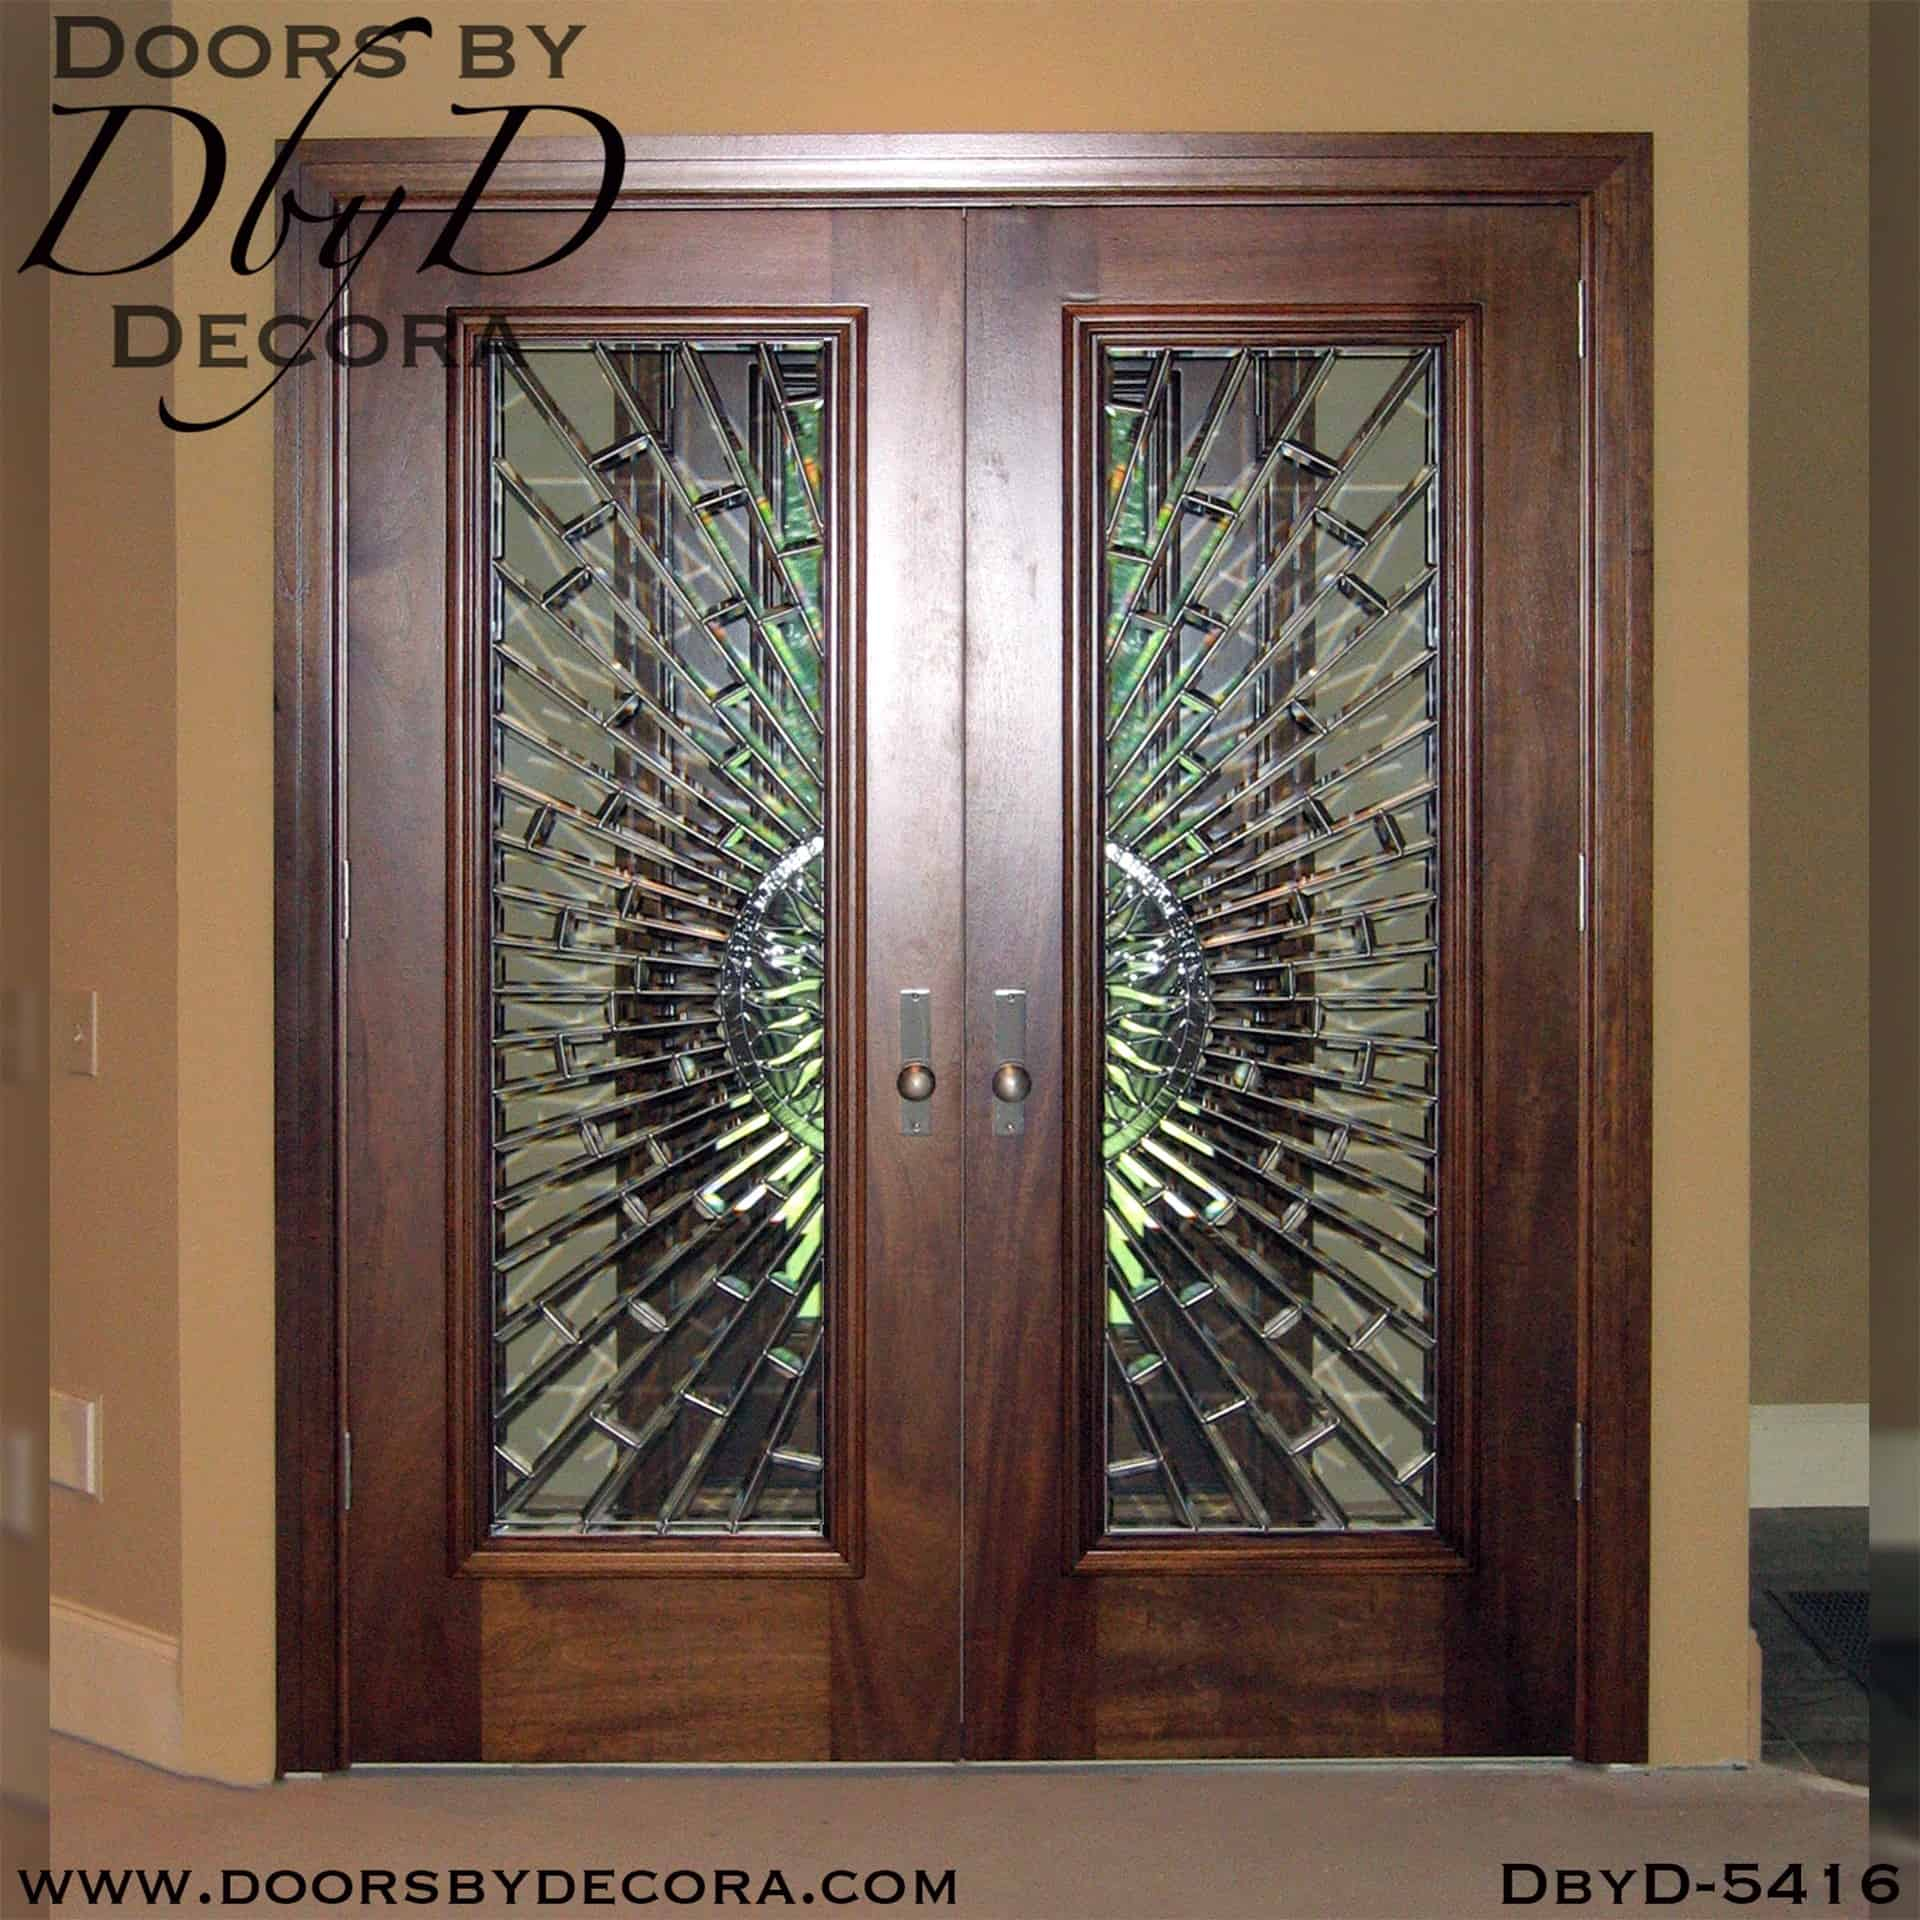 Custom Modern Leaded Glass Doors Solid Wood Entry Doors By Decora